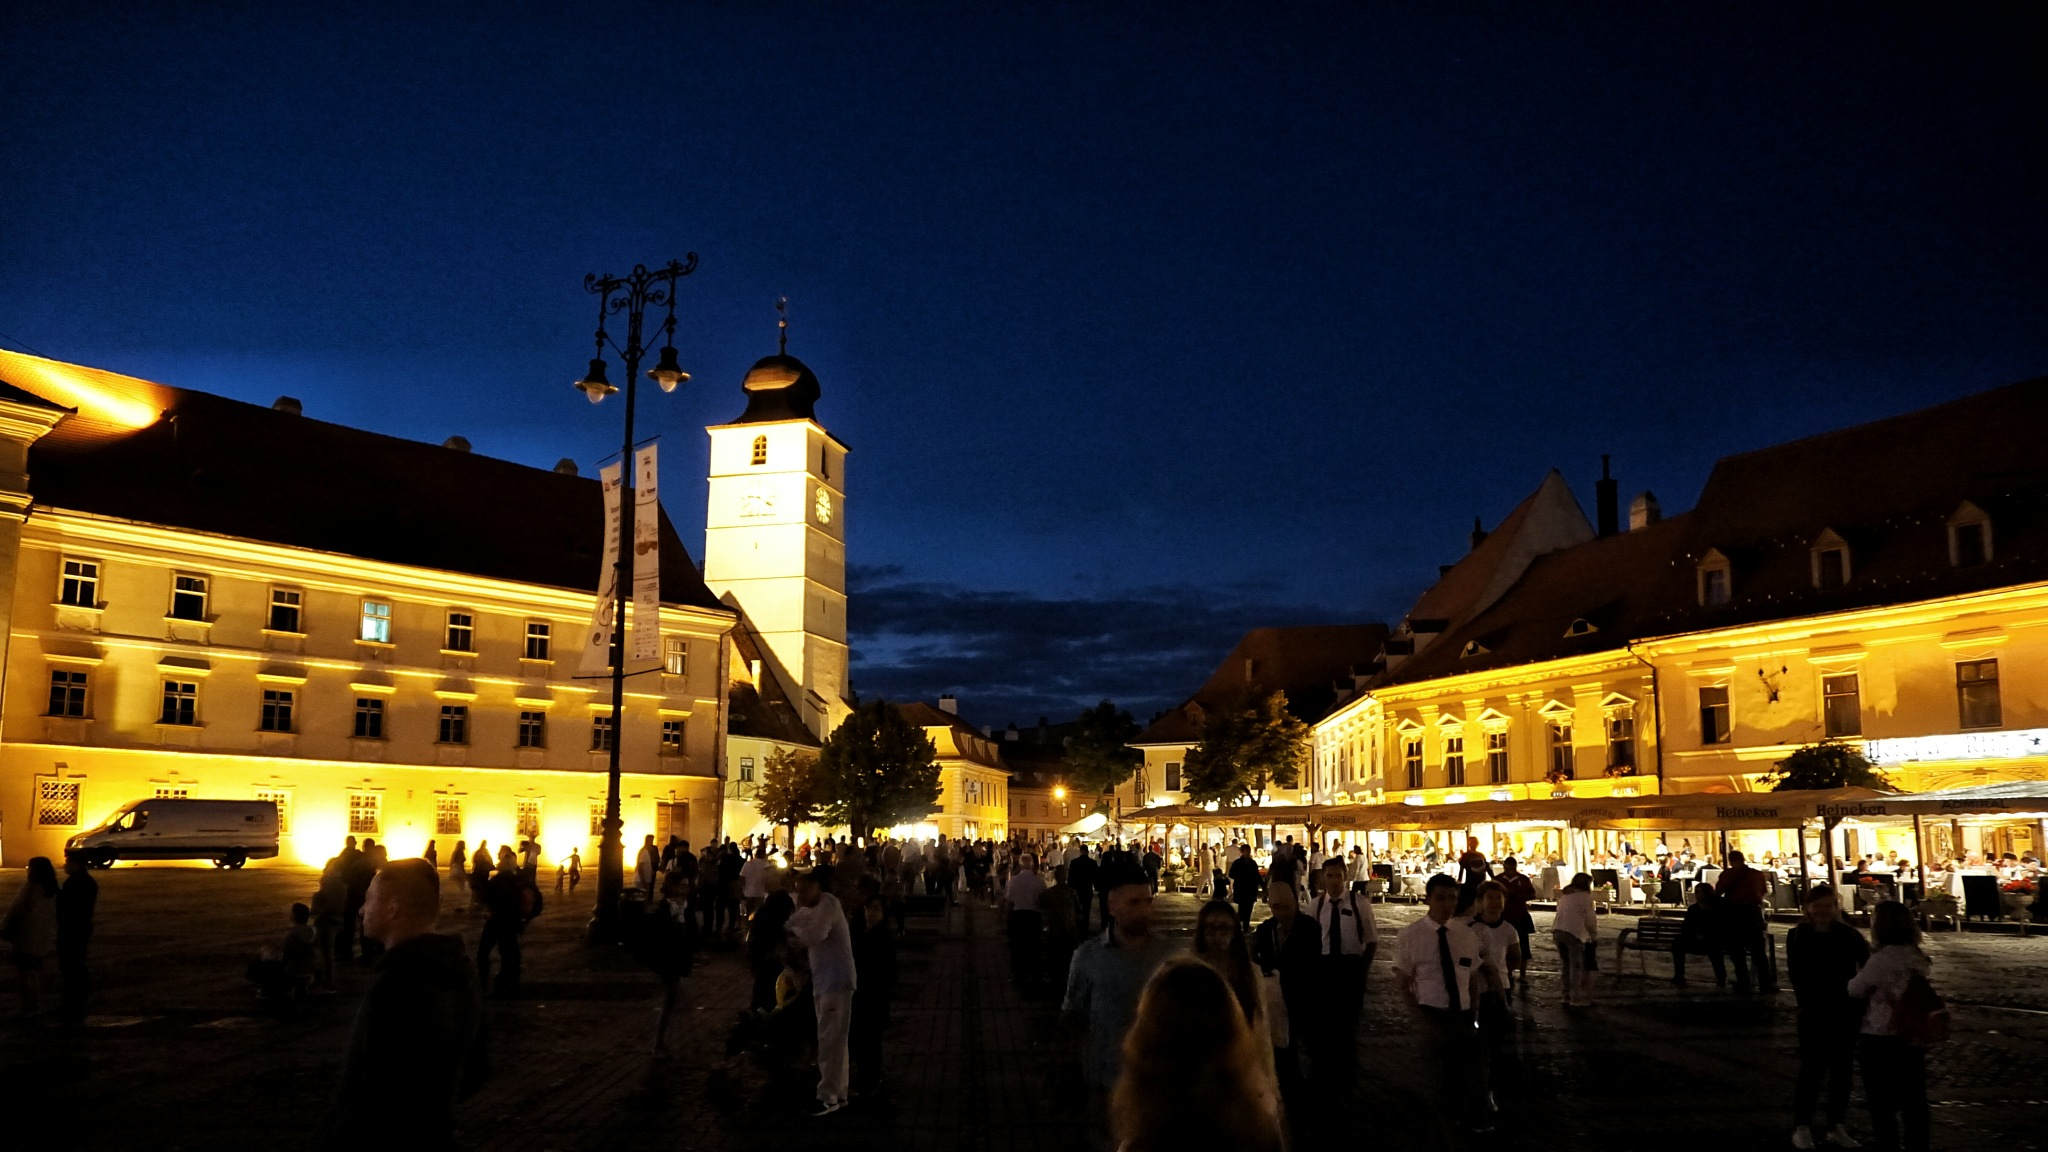 Sibiu by night by Costin0509